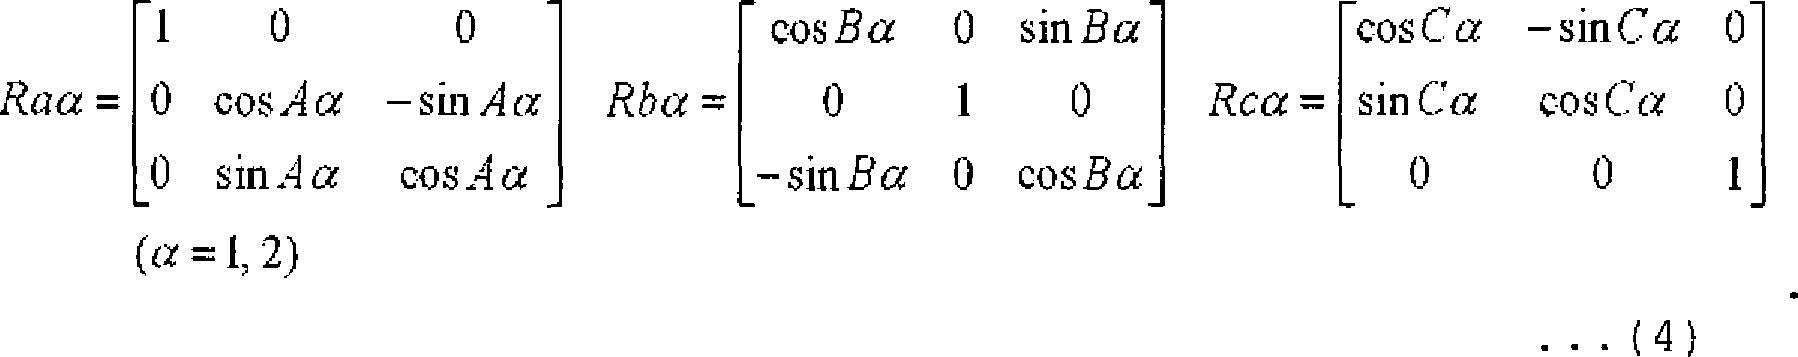 Atemberaubend Funktionsblockdiagramme Ideen - Elektrische Schaltplan ...